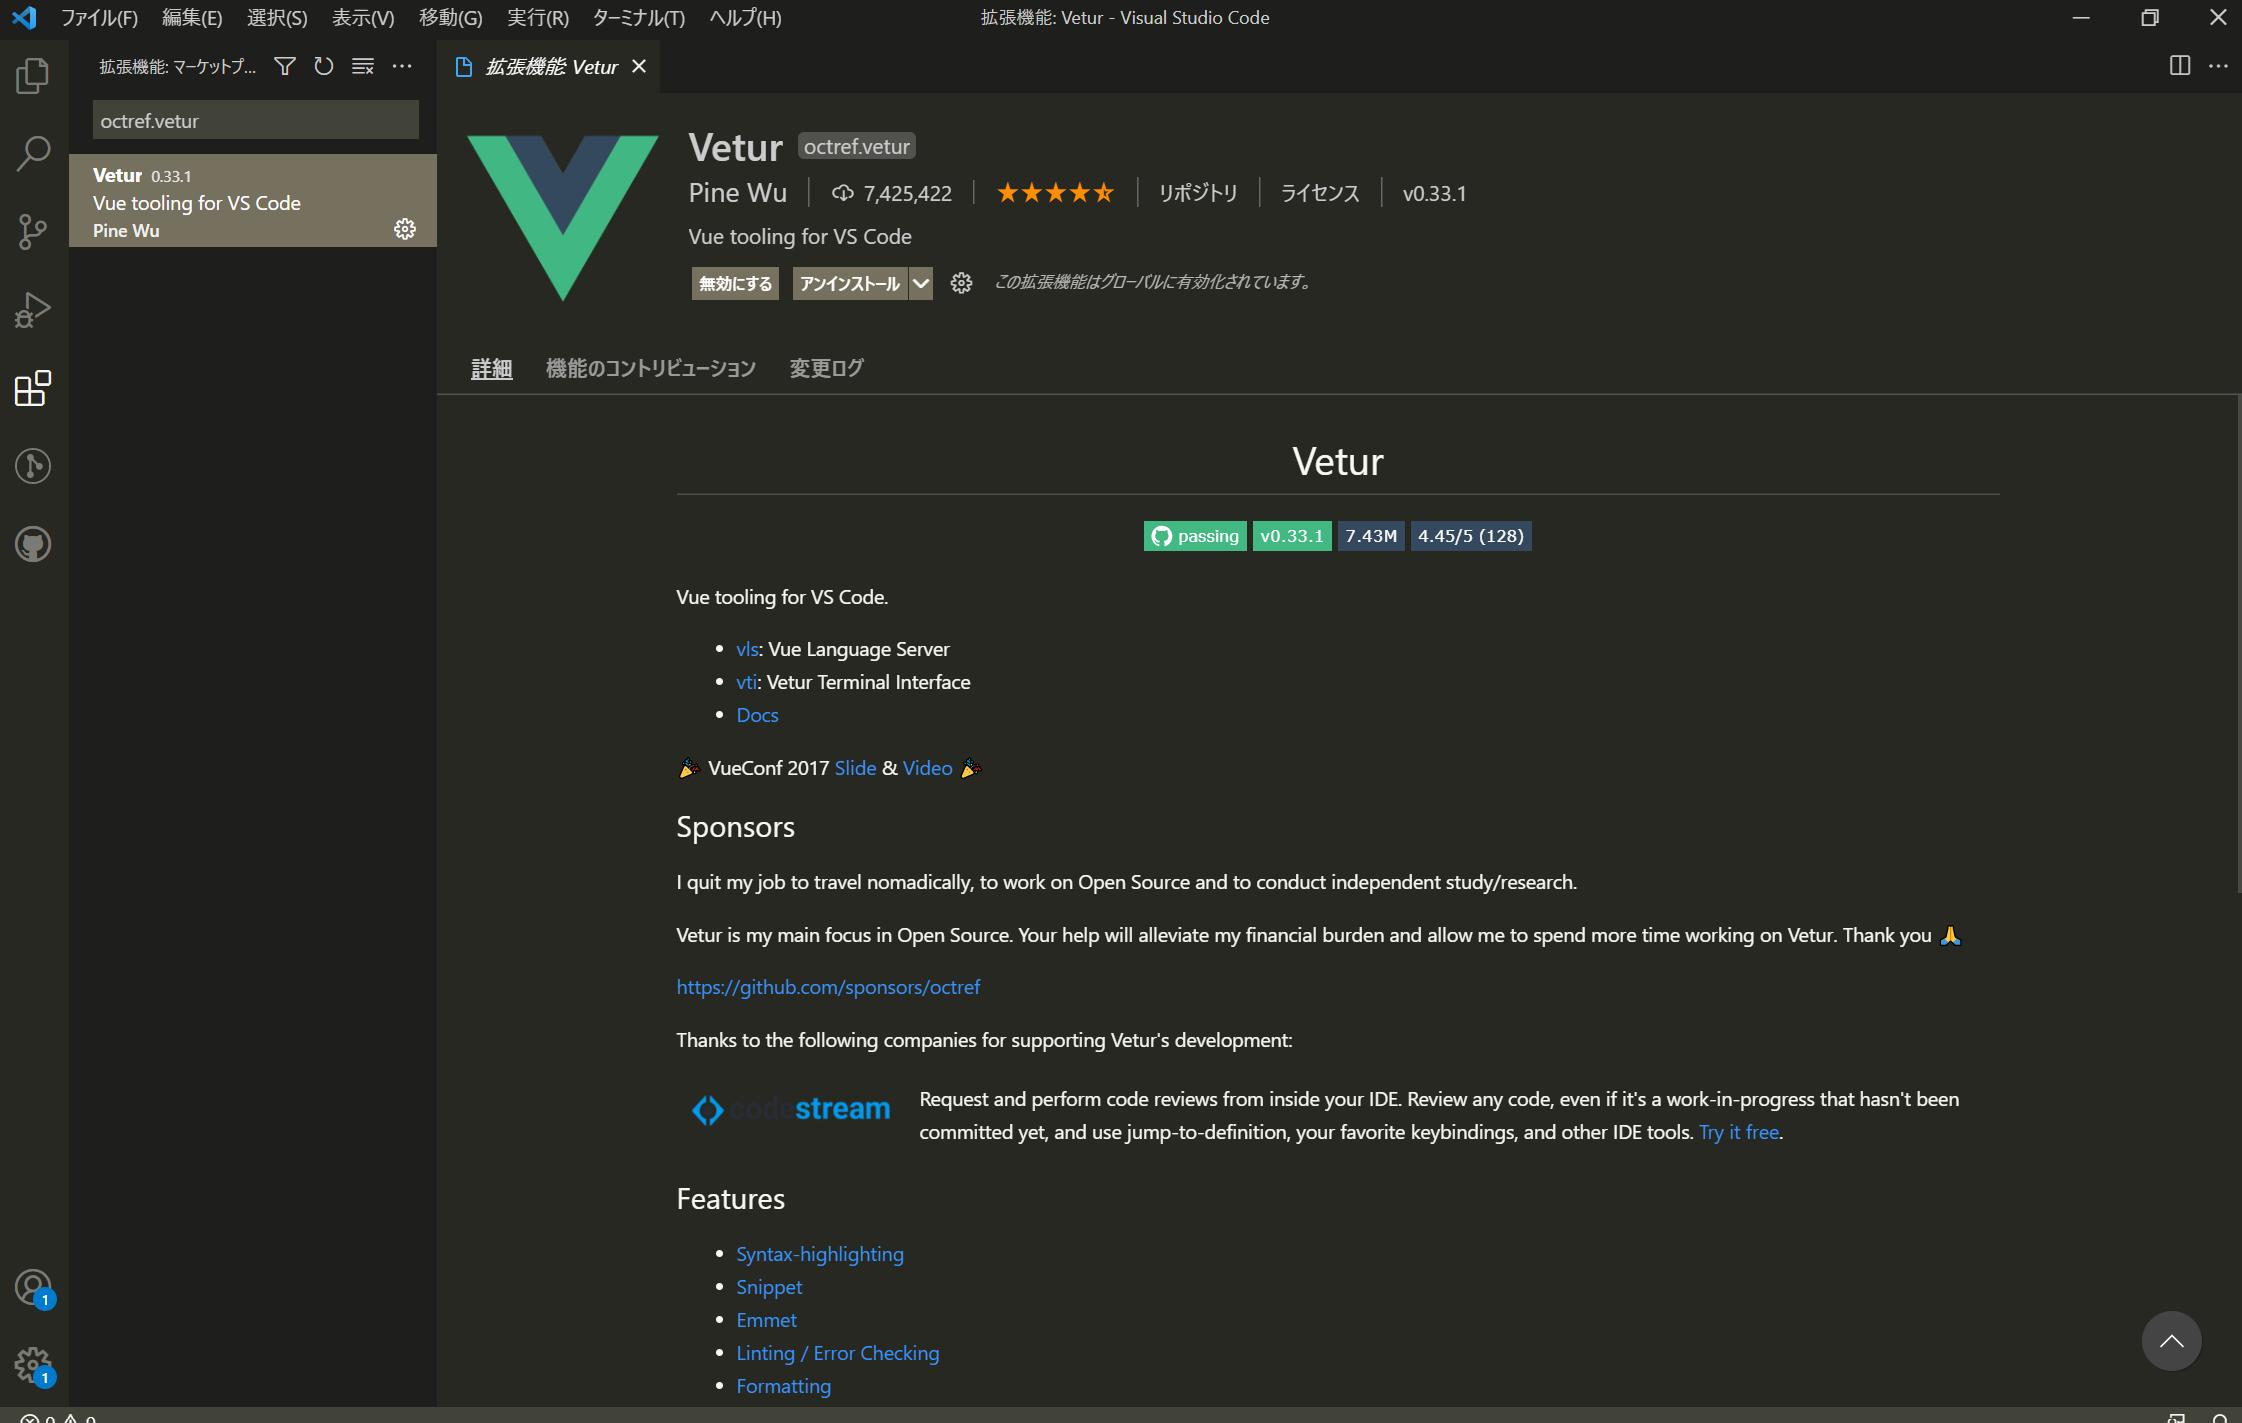 JavaSpring_vscode_04